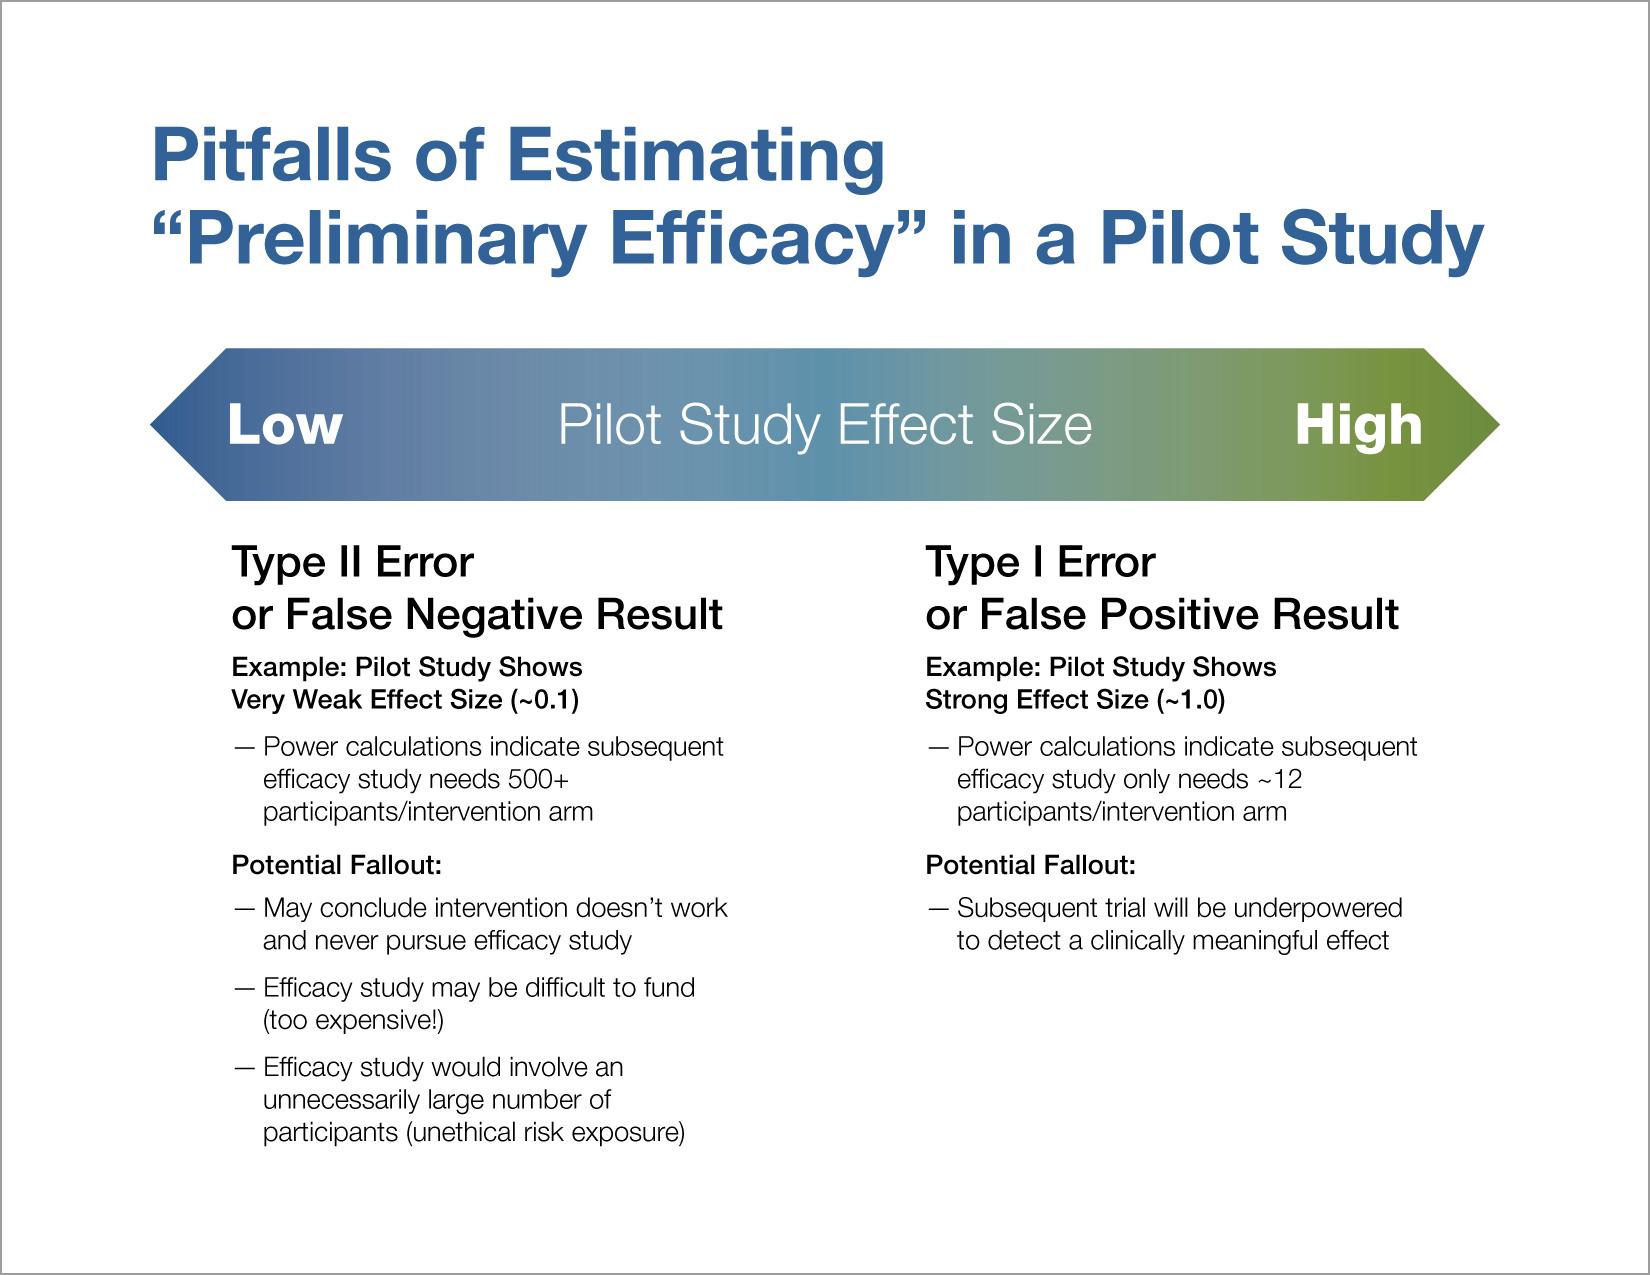 Pilot-Study-Effect-Size-A_03.